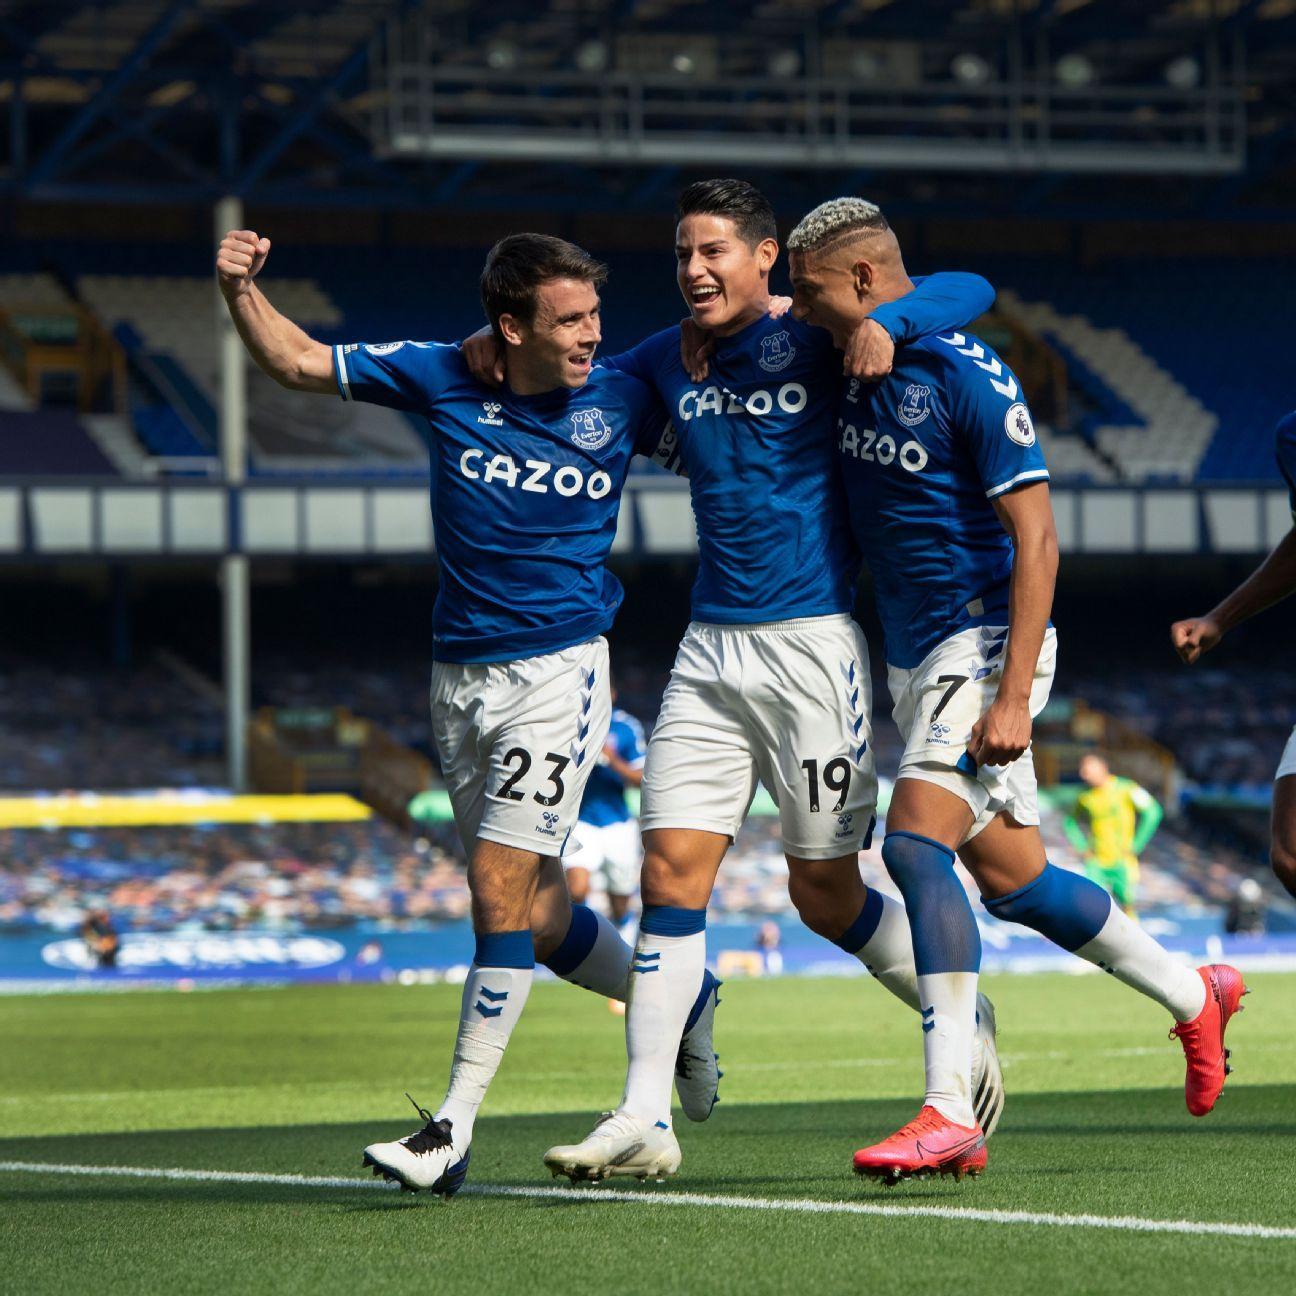 Everton vs. West Bromwich Albion - Football Match Report - September 19, 2020 - ESPN Australia